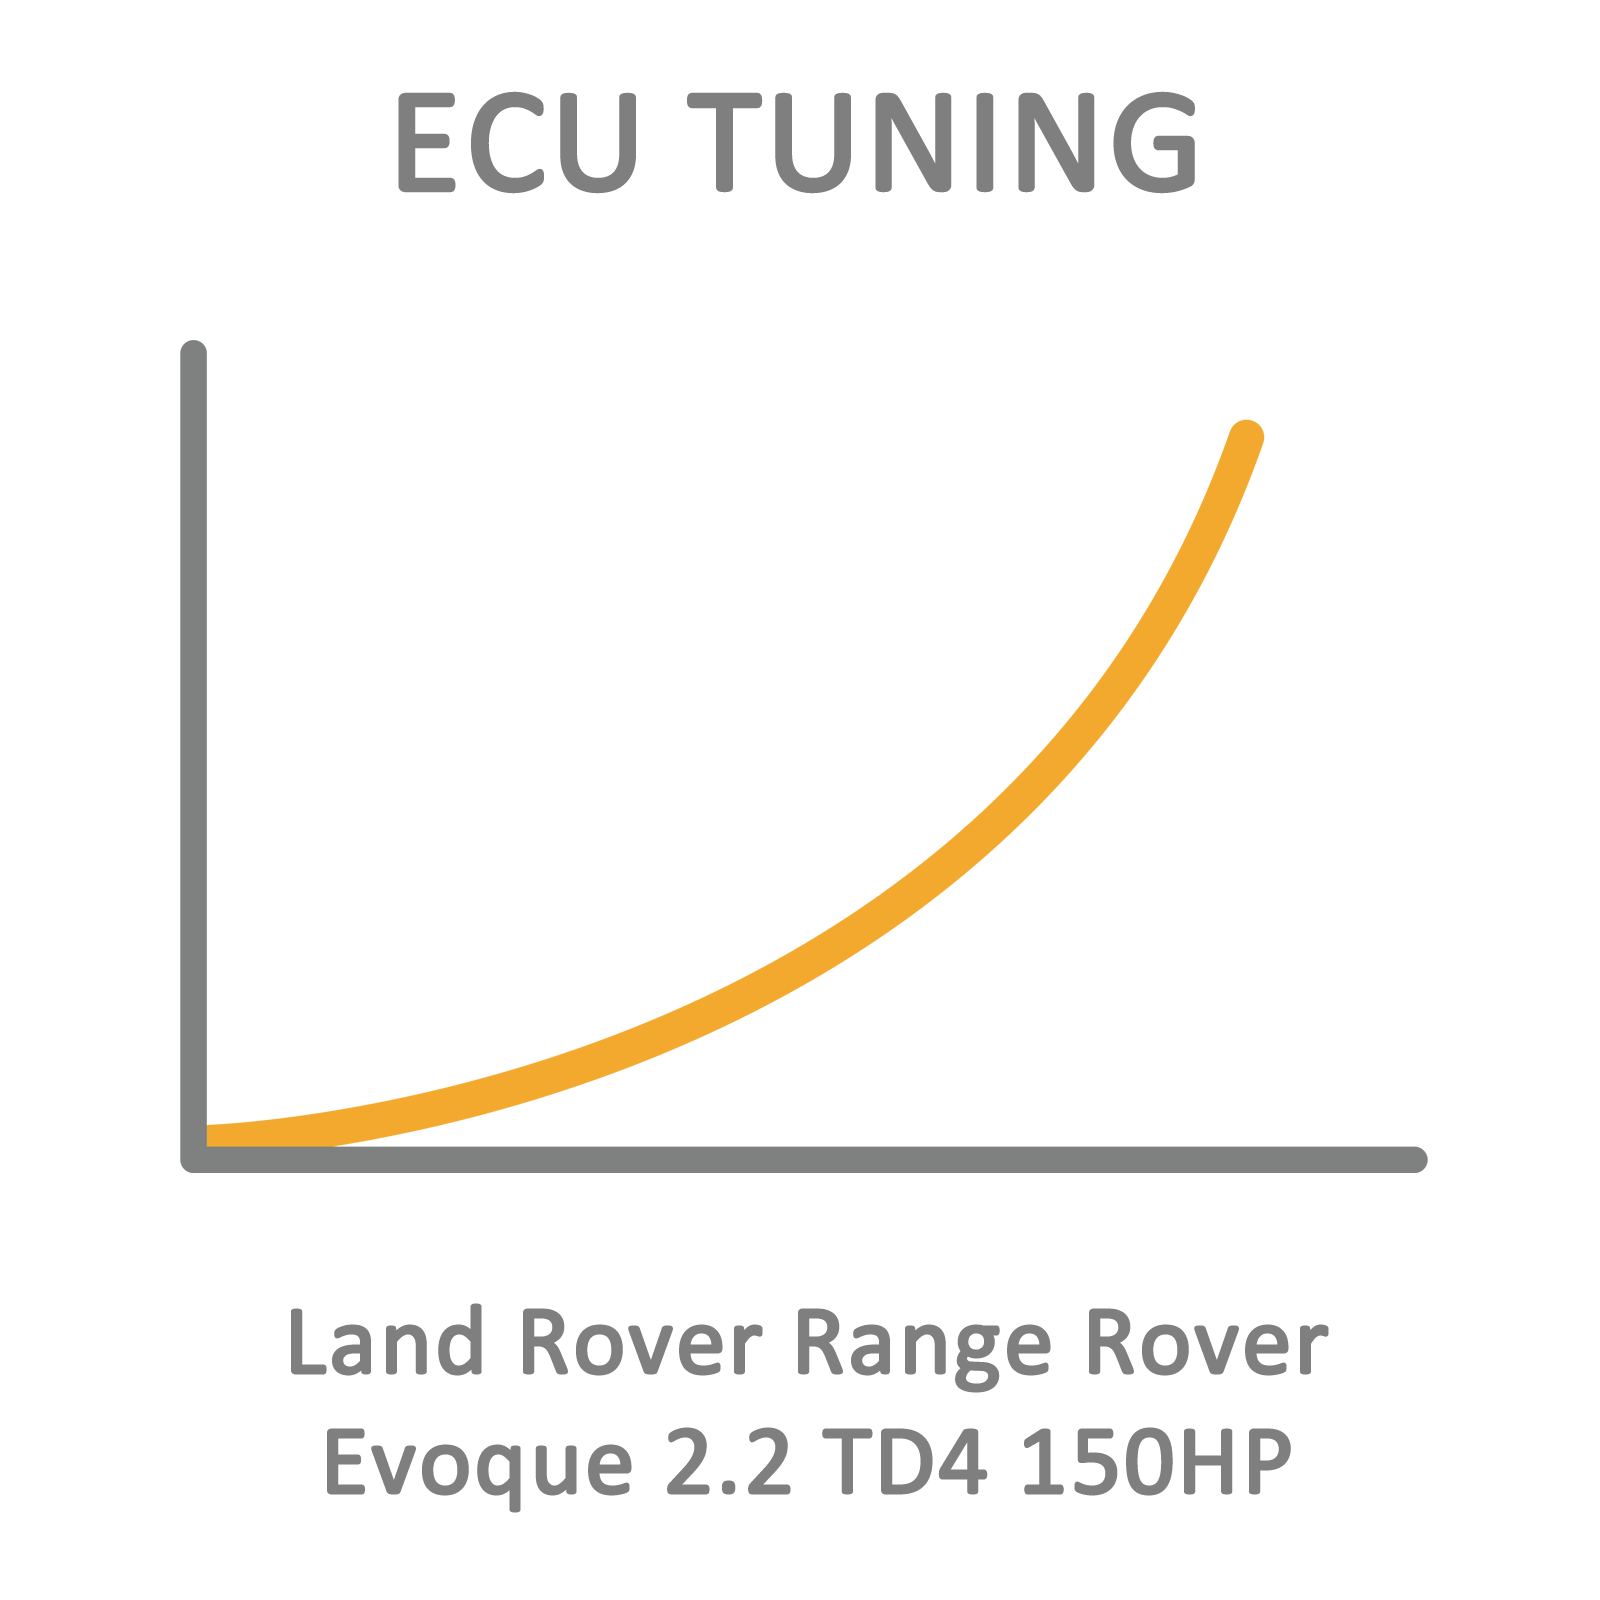 Land Rover Range Rover Evoque 2.2 TD4 150HP ECU Tuning